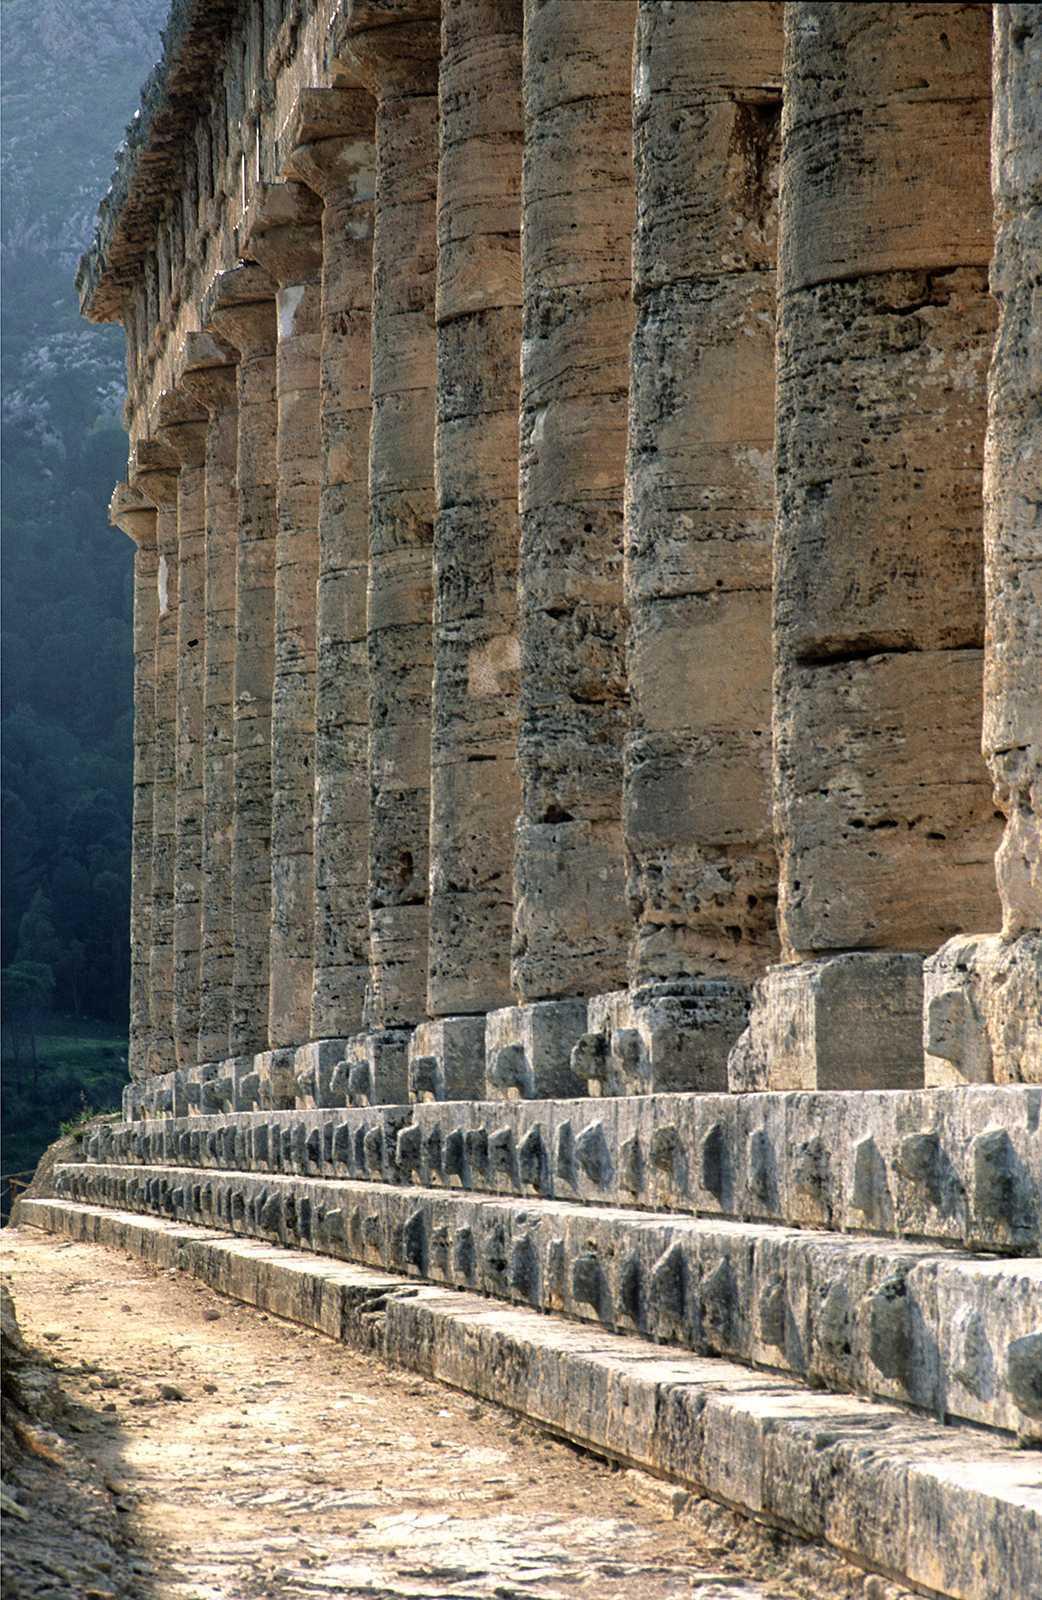 Segesta Temple, Sicily, Italy, 2000.